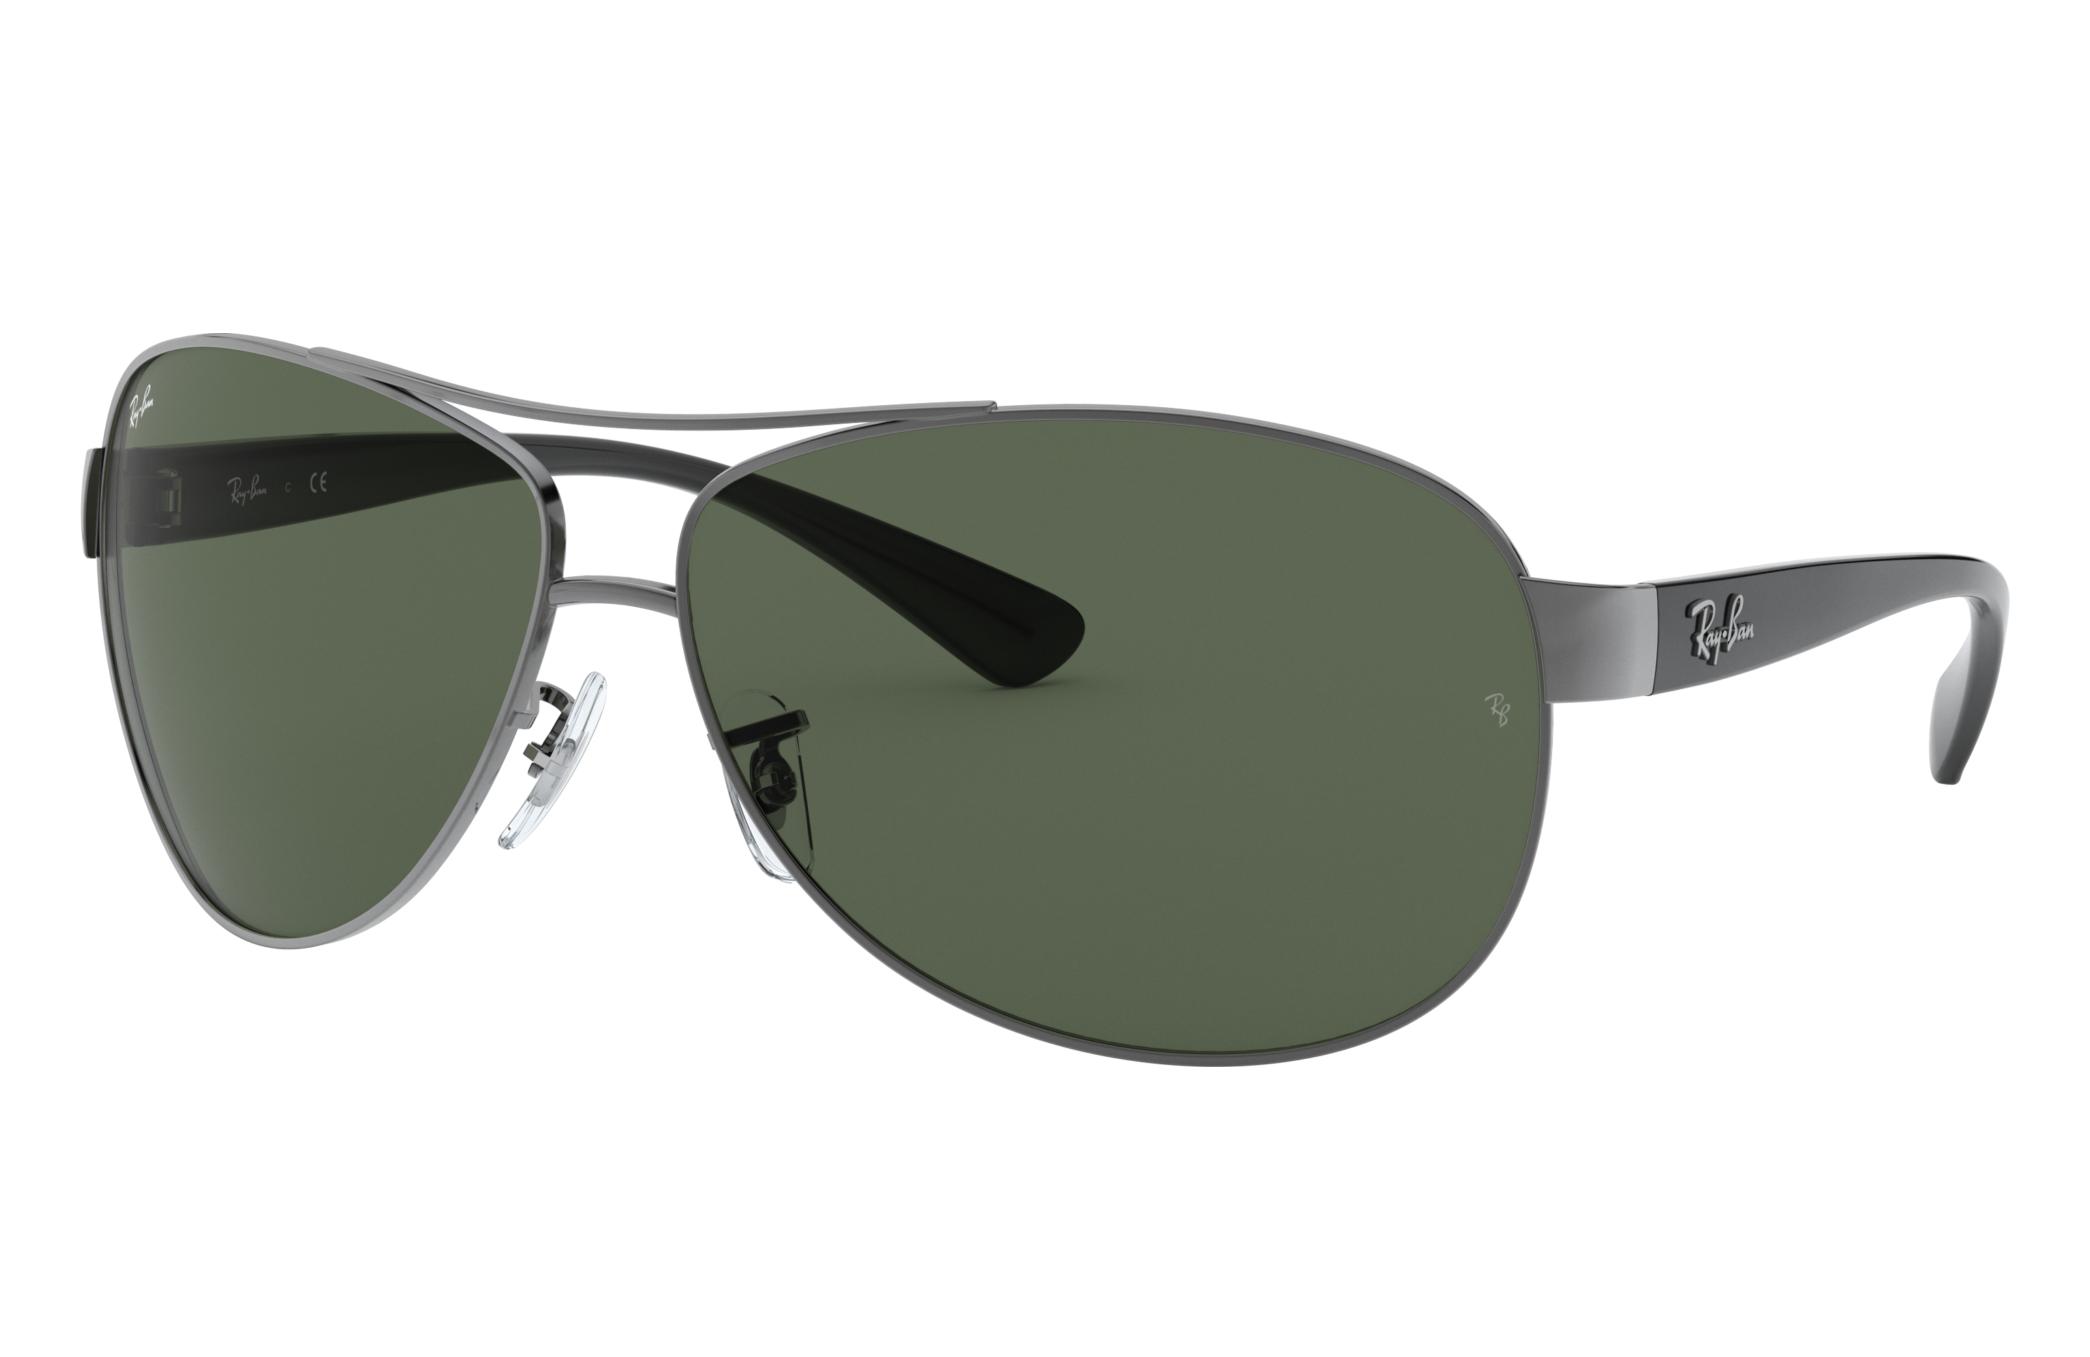 Ray-Ban Rb3386 Black, Green Lenses - RB3386